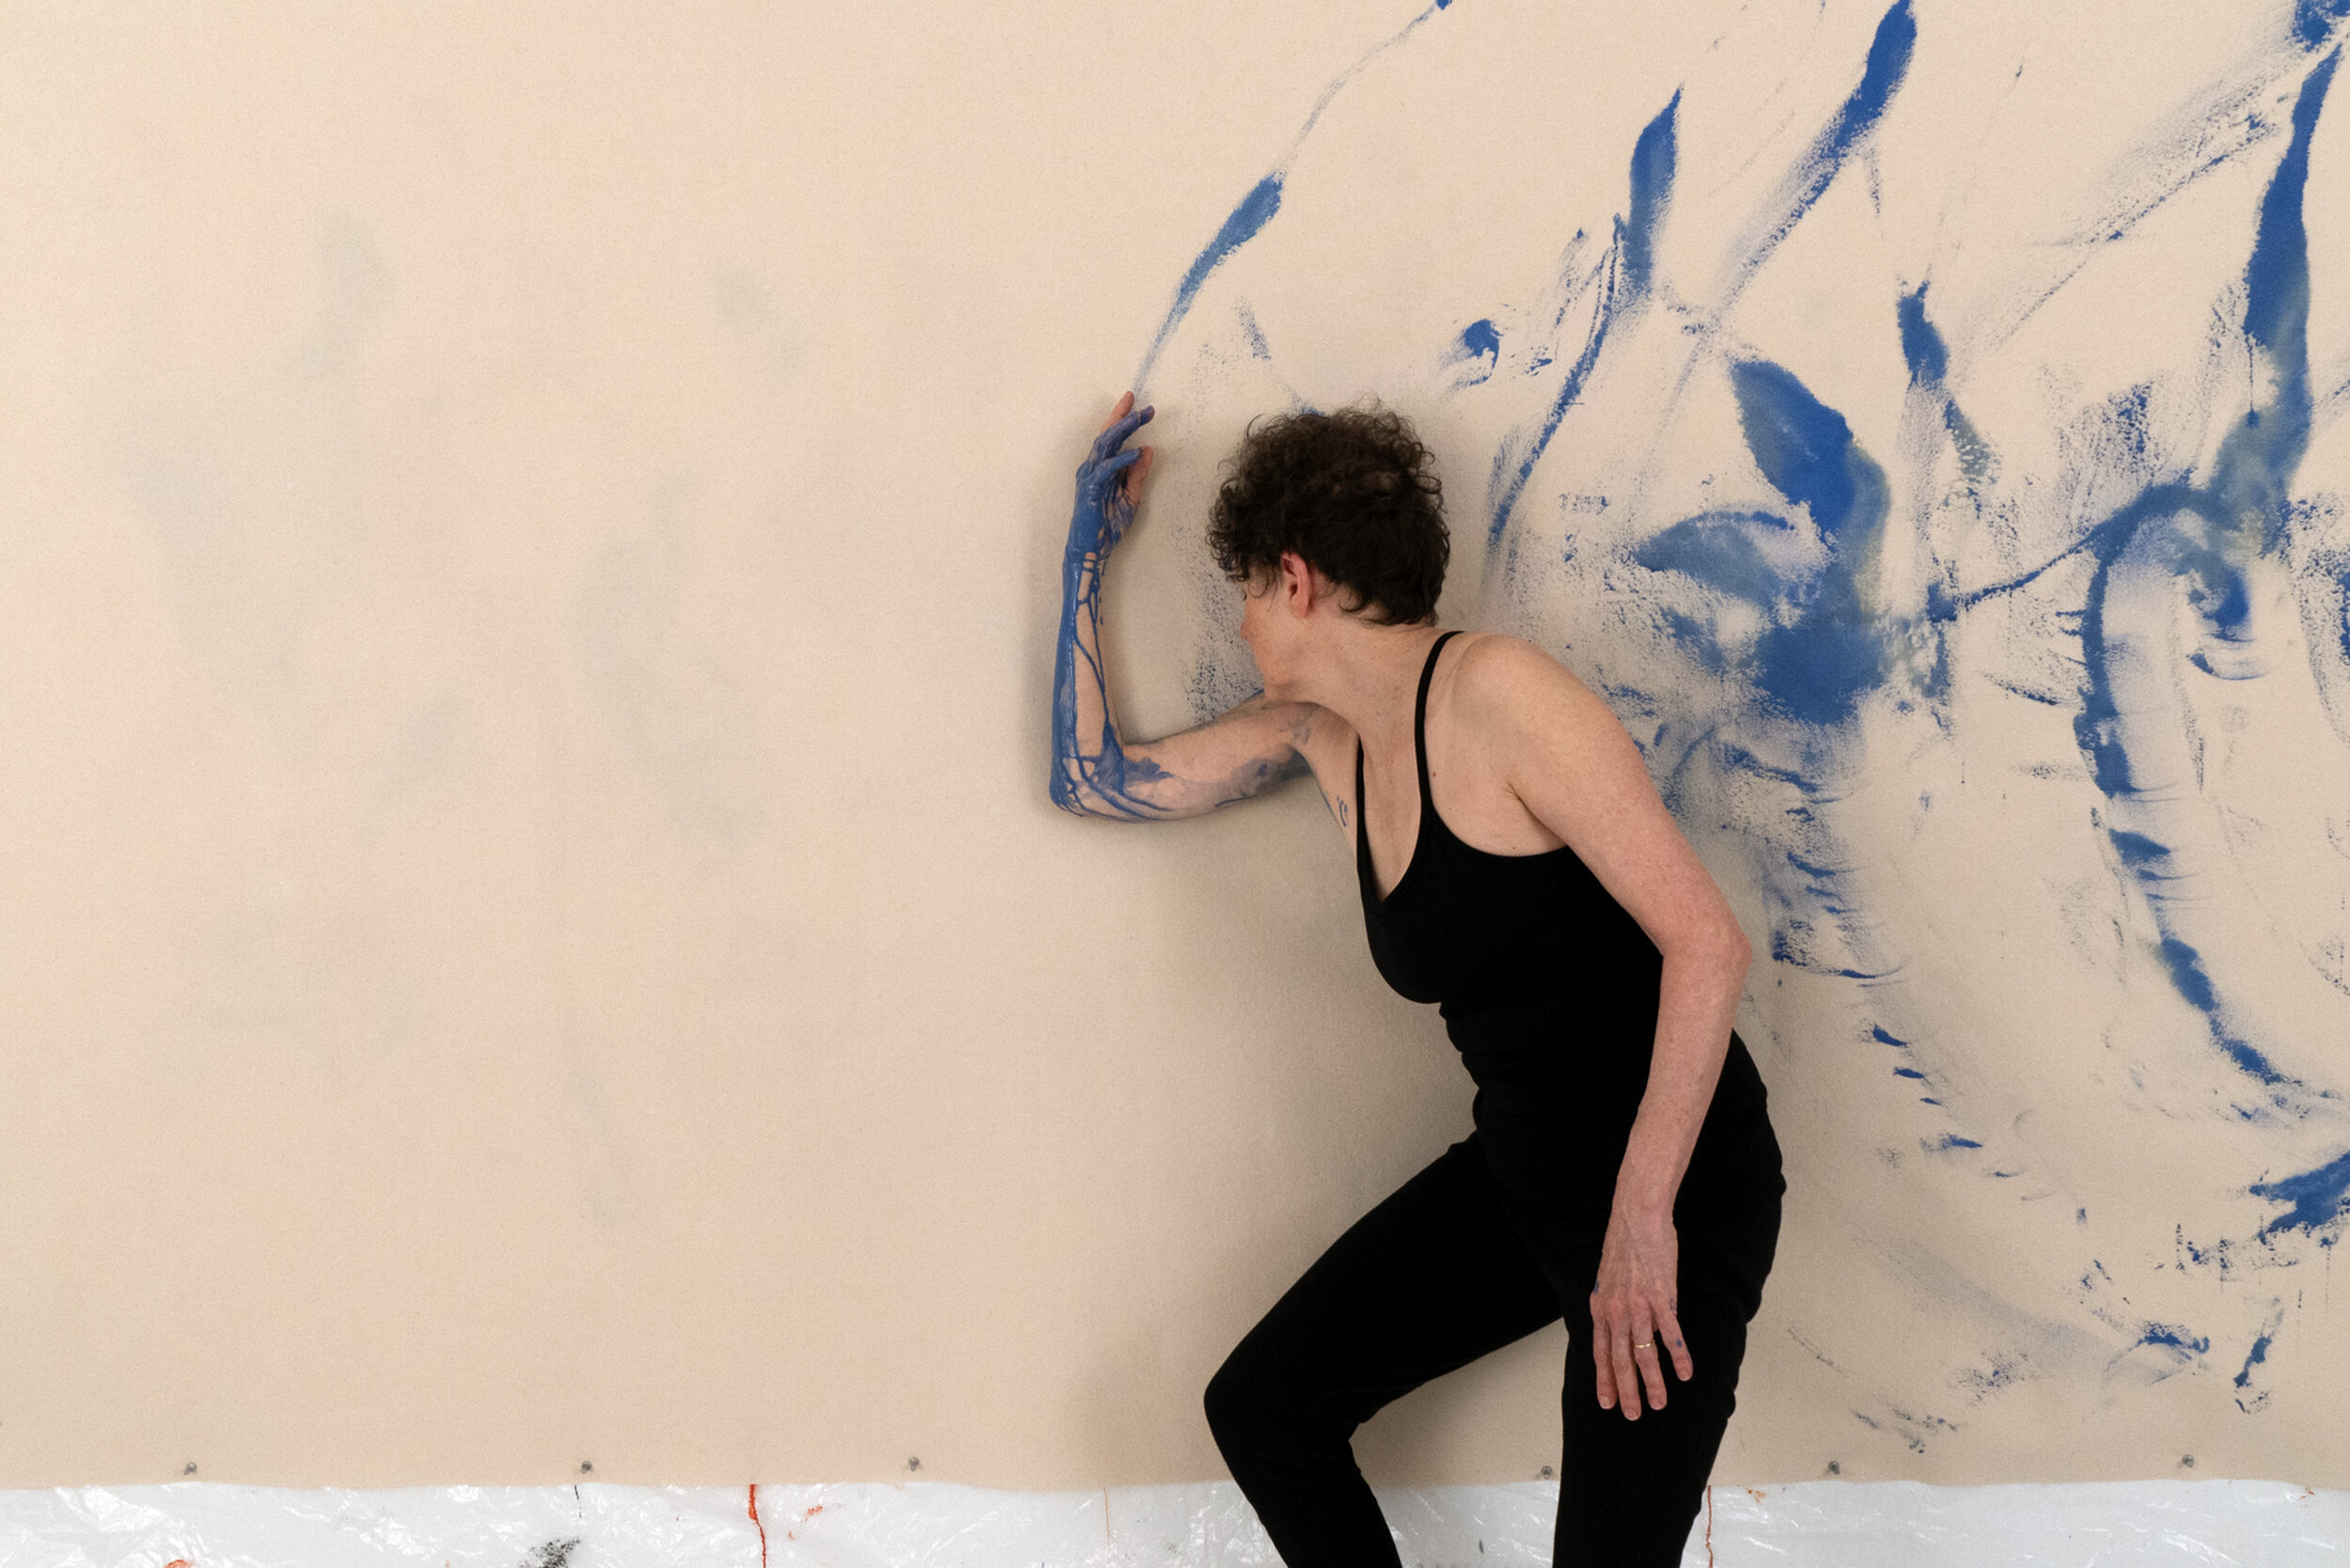 Katy_Martin_GuanYin_(Painting_Performed)_2.jpg